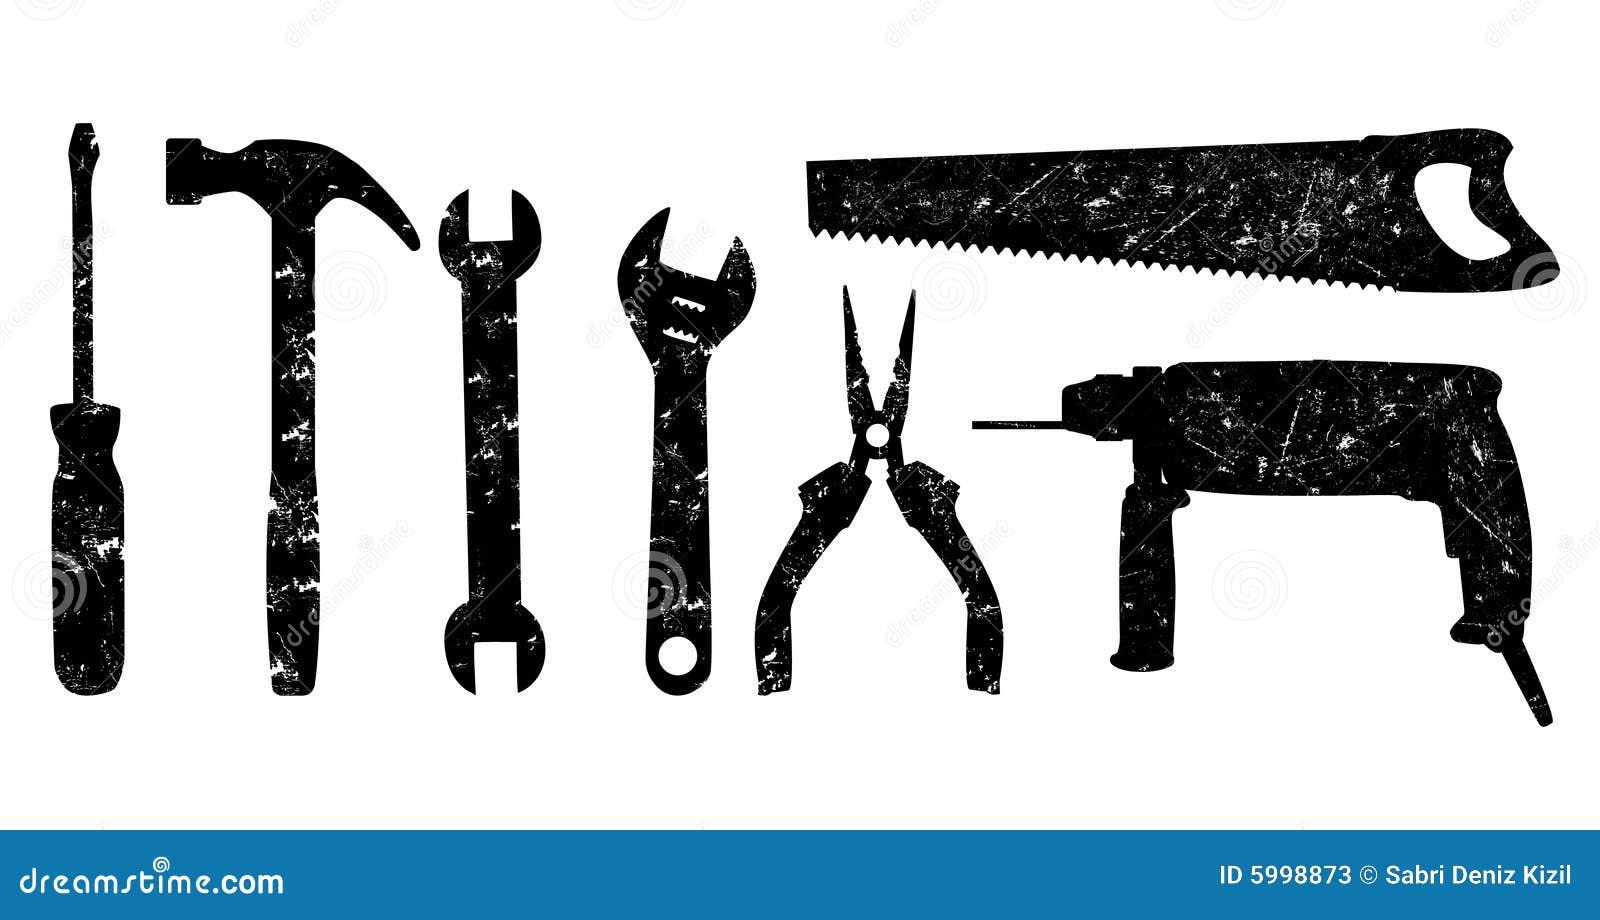 Grunge utiliza ferramentas o vetor